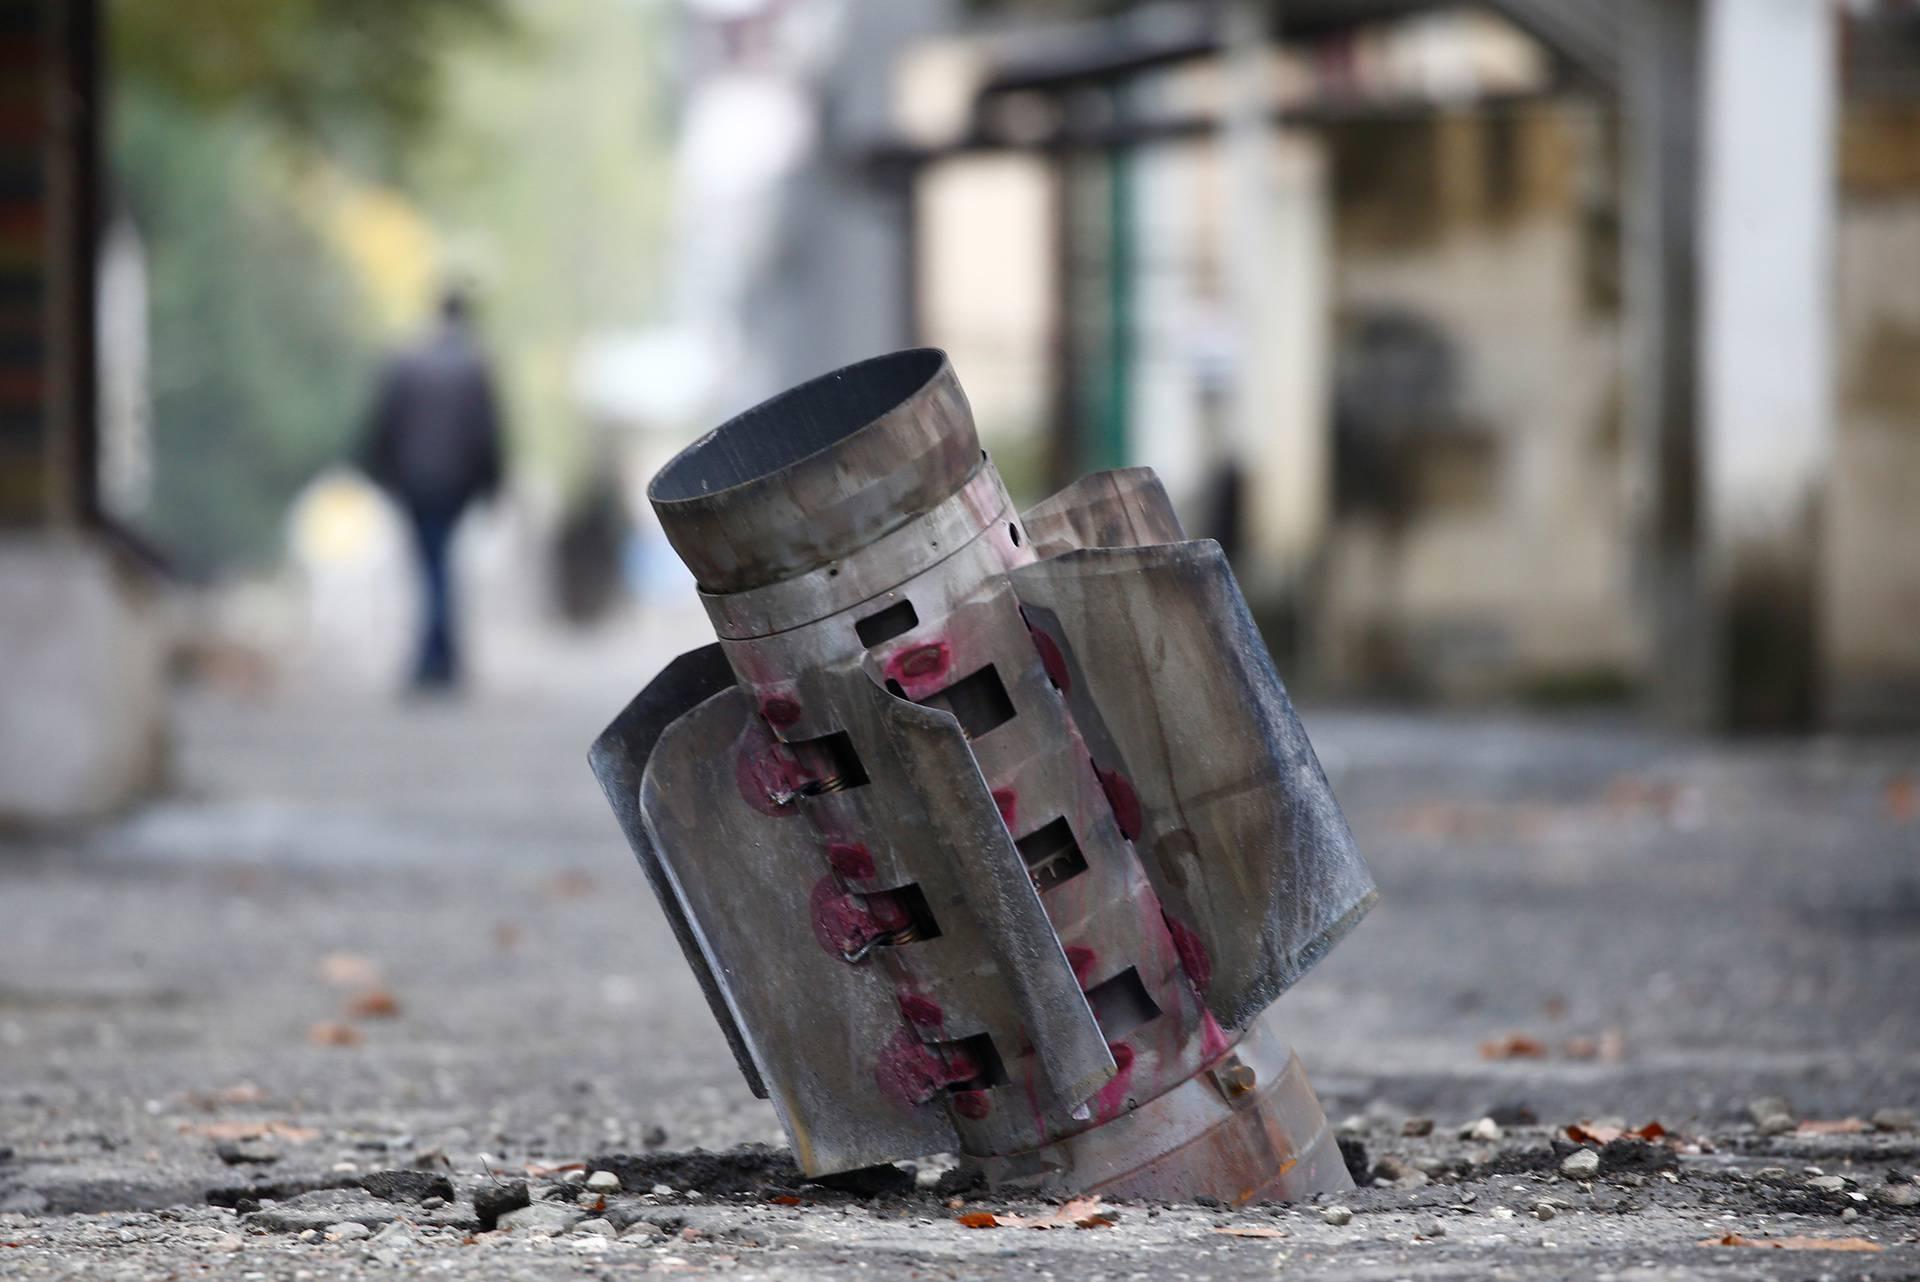 Military conflict over the breakaway region of Nagorno-Karabakh